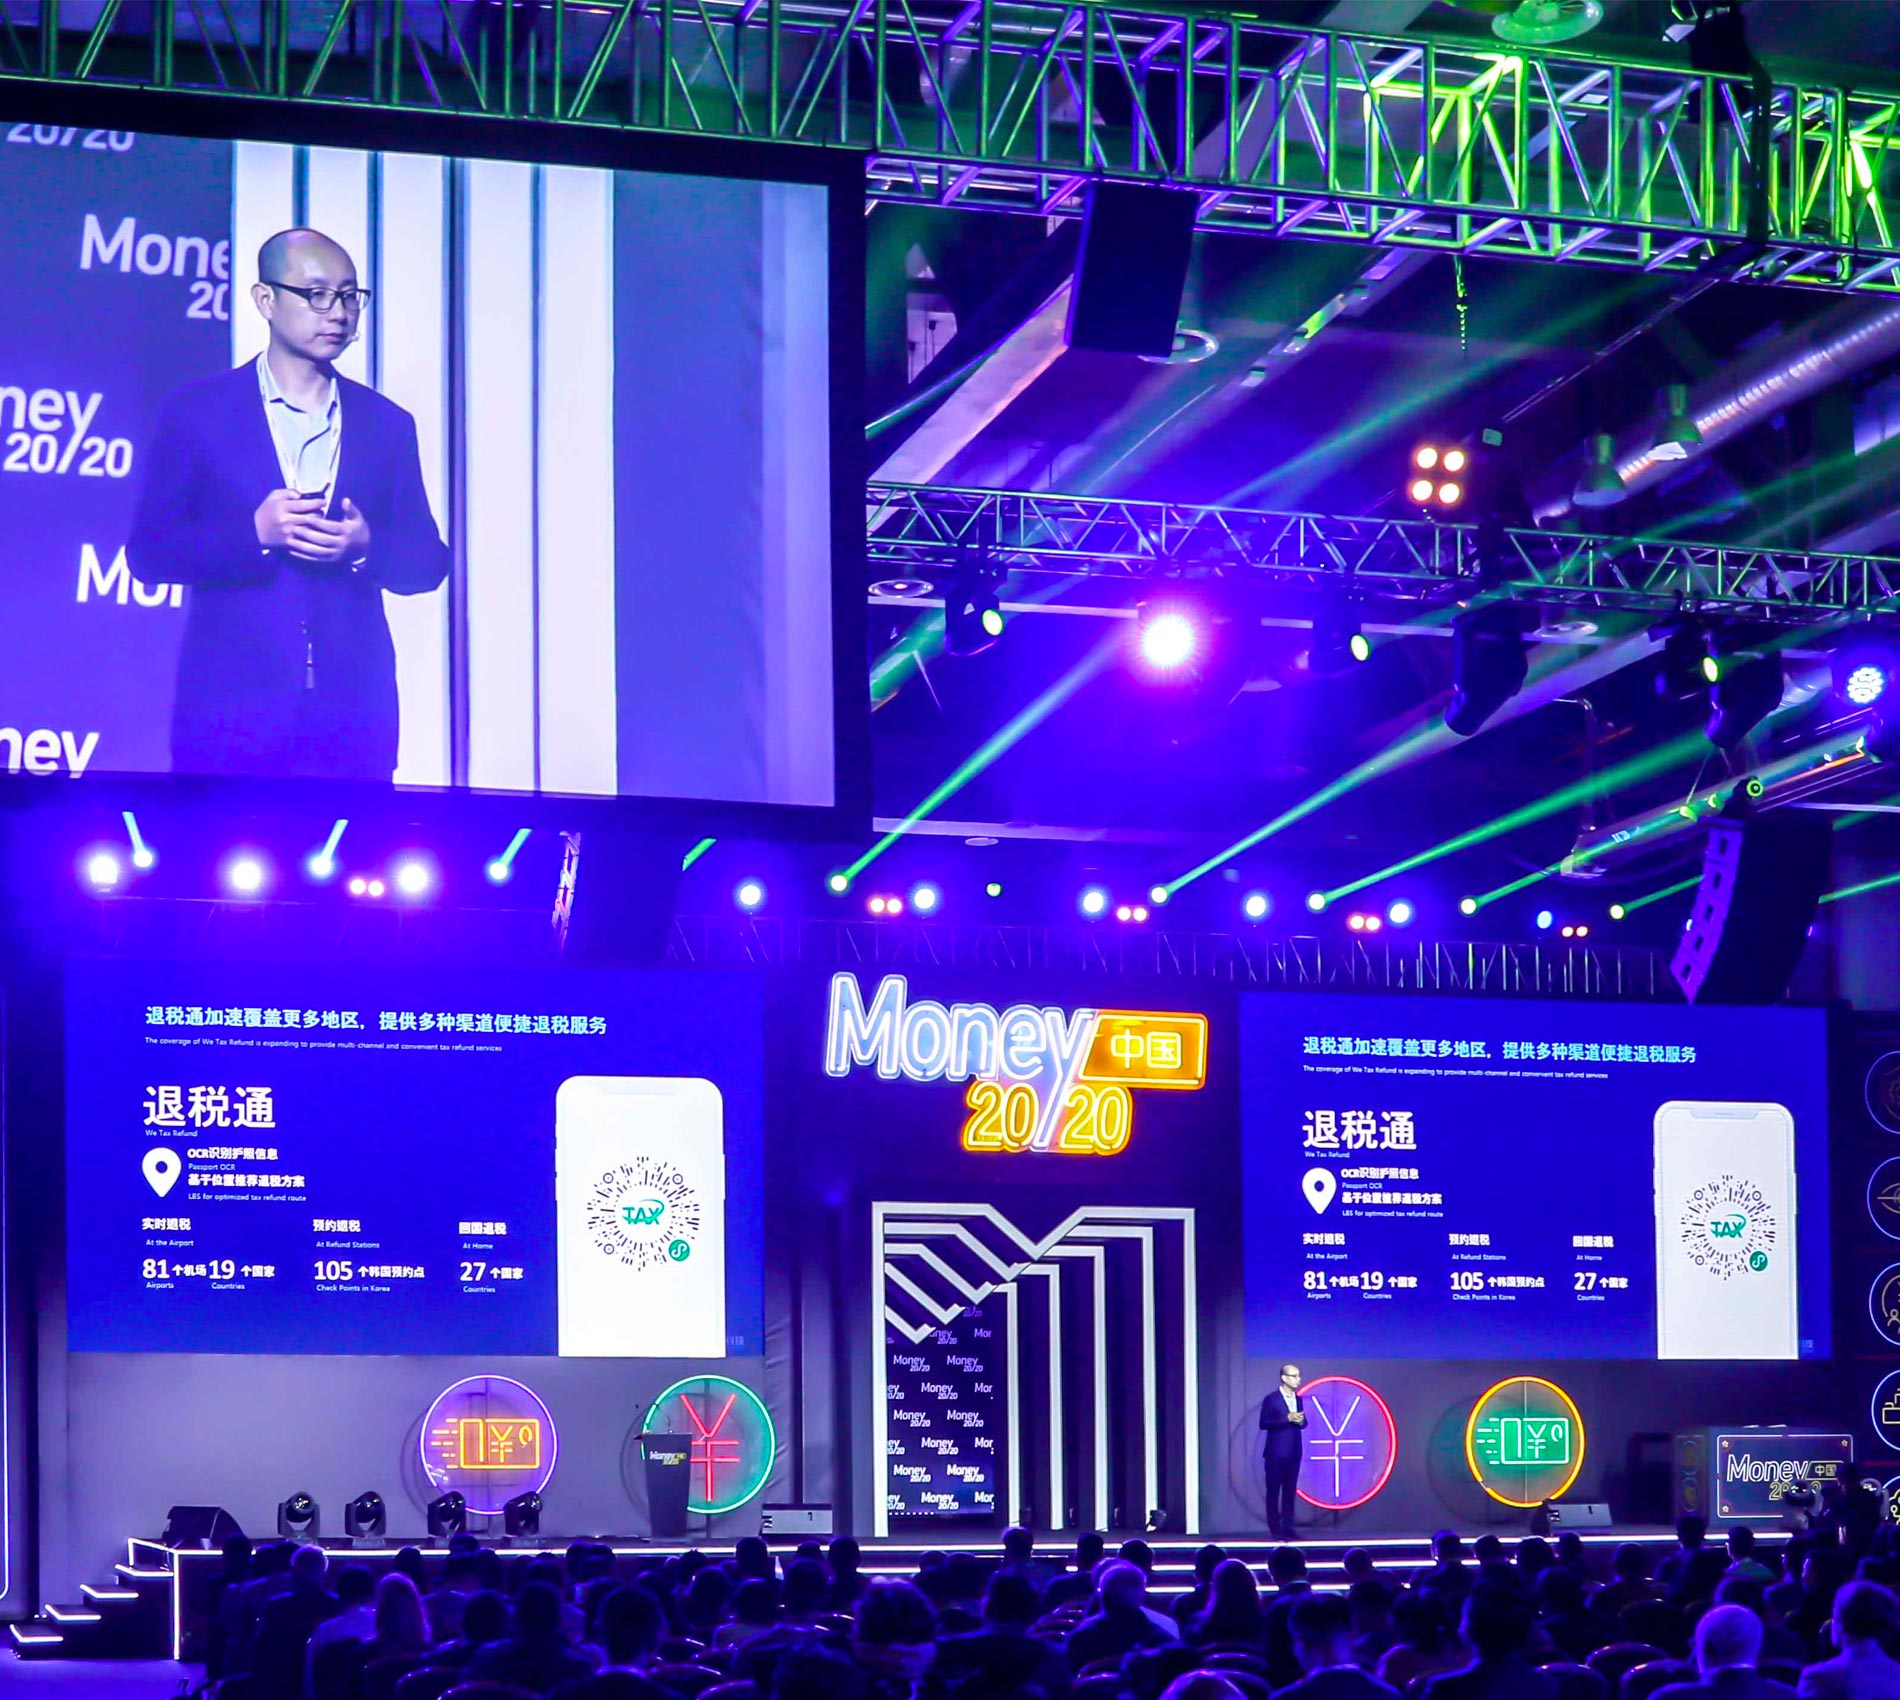 Highlights of Money 20/20 China